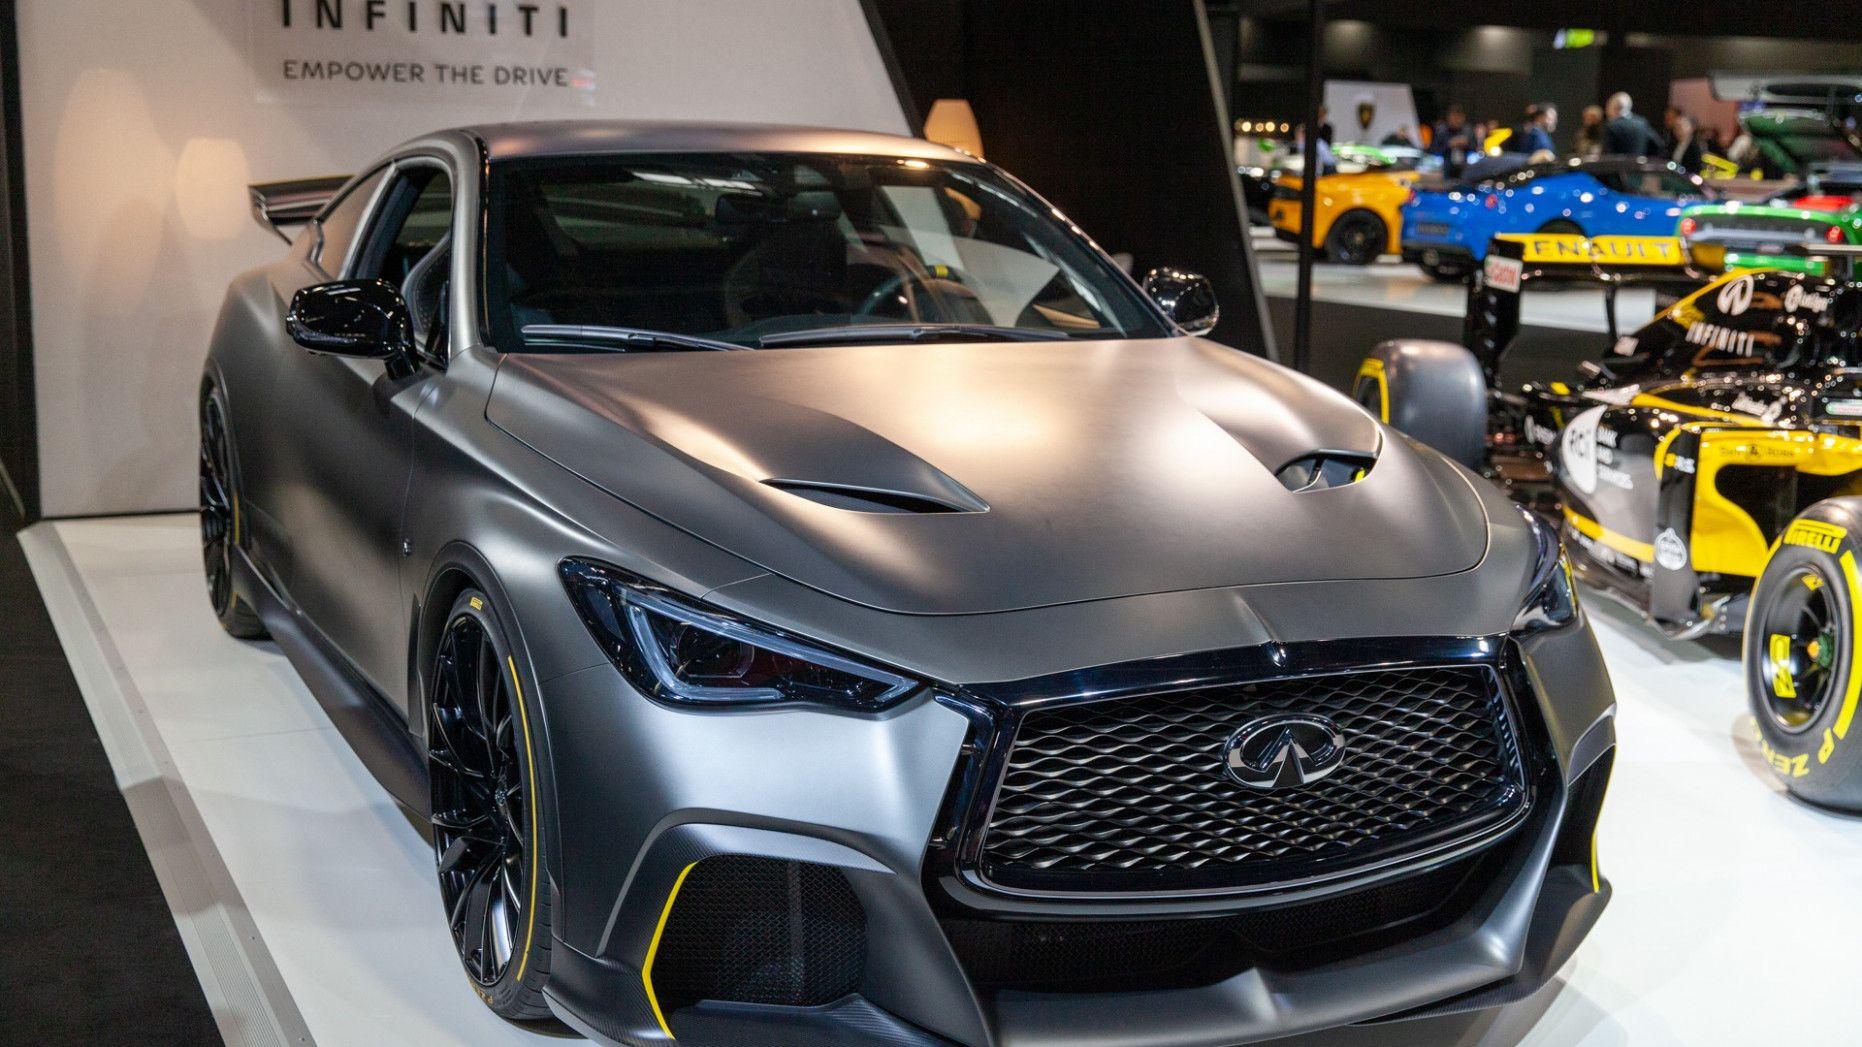 2020 Infiniti Q60 Black S Prices In 2020 Infiniti Car Review Black